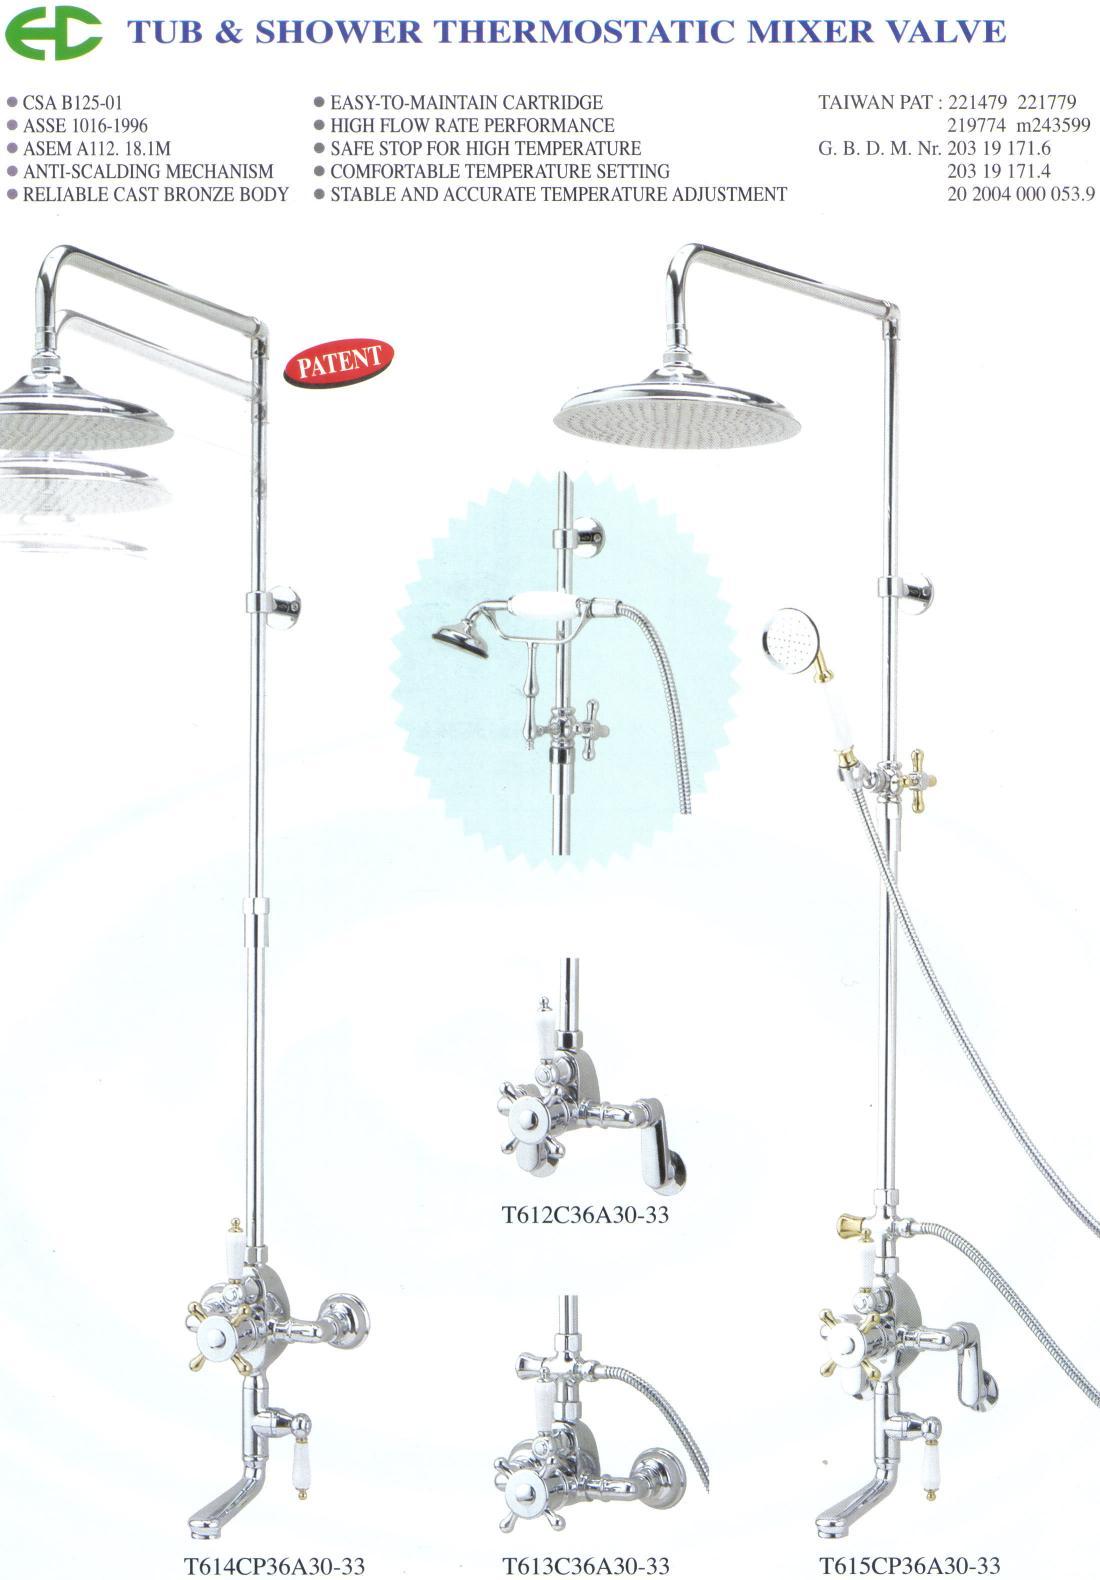 Kitchen & Bathroom Delta Faucets, Sinks, Fixtures and Hardware ...